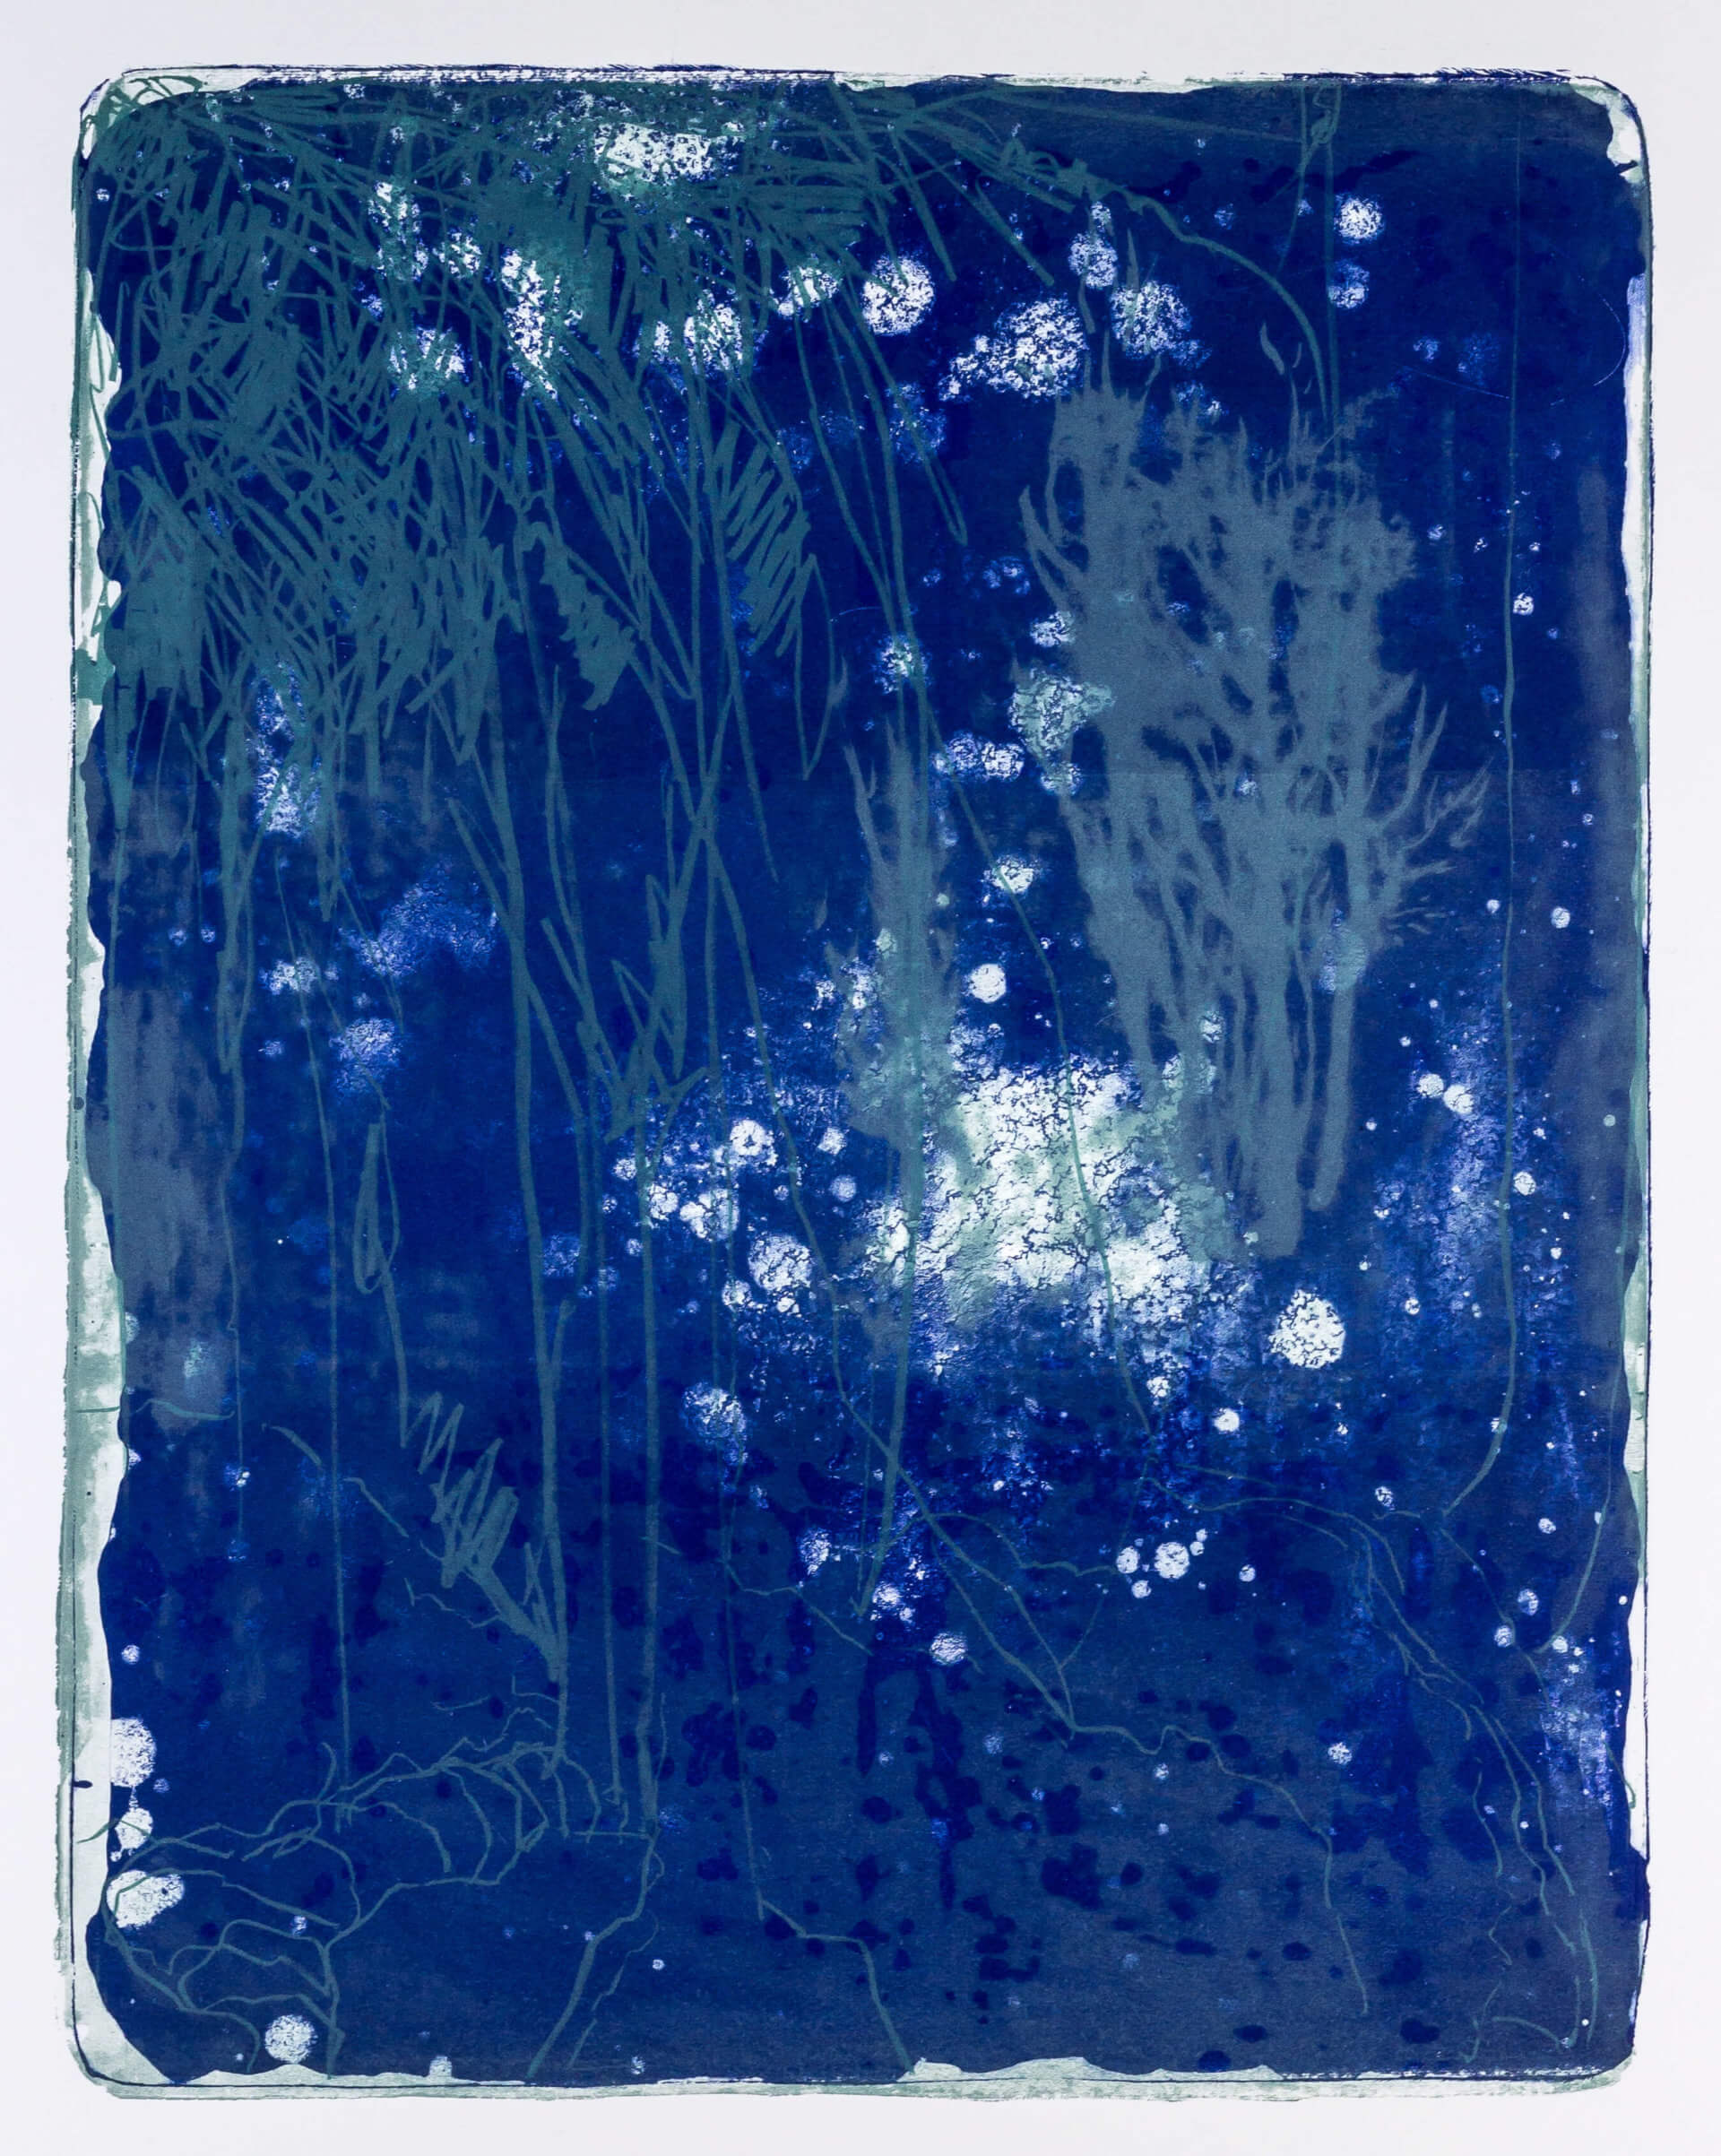 Katharina Albers, Wald X-XXV, 2015, Farblithographie, Unikat, 50×40 cm